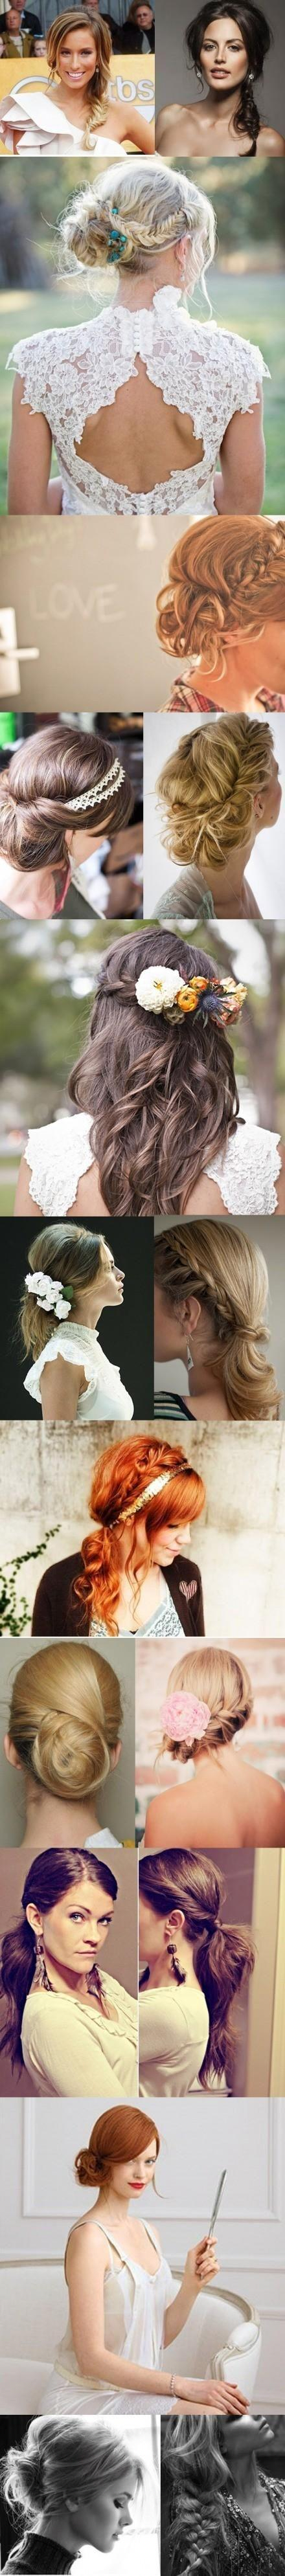 Hairstyles & Hair Accessories weddings-bridal-fini